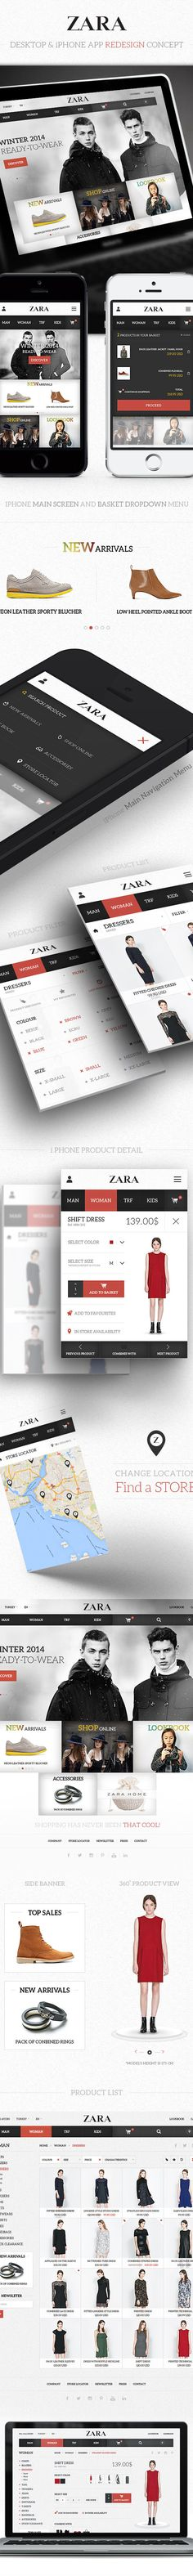 Zara / Desktop & iPhone App Redesign on App Design Served